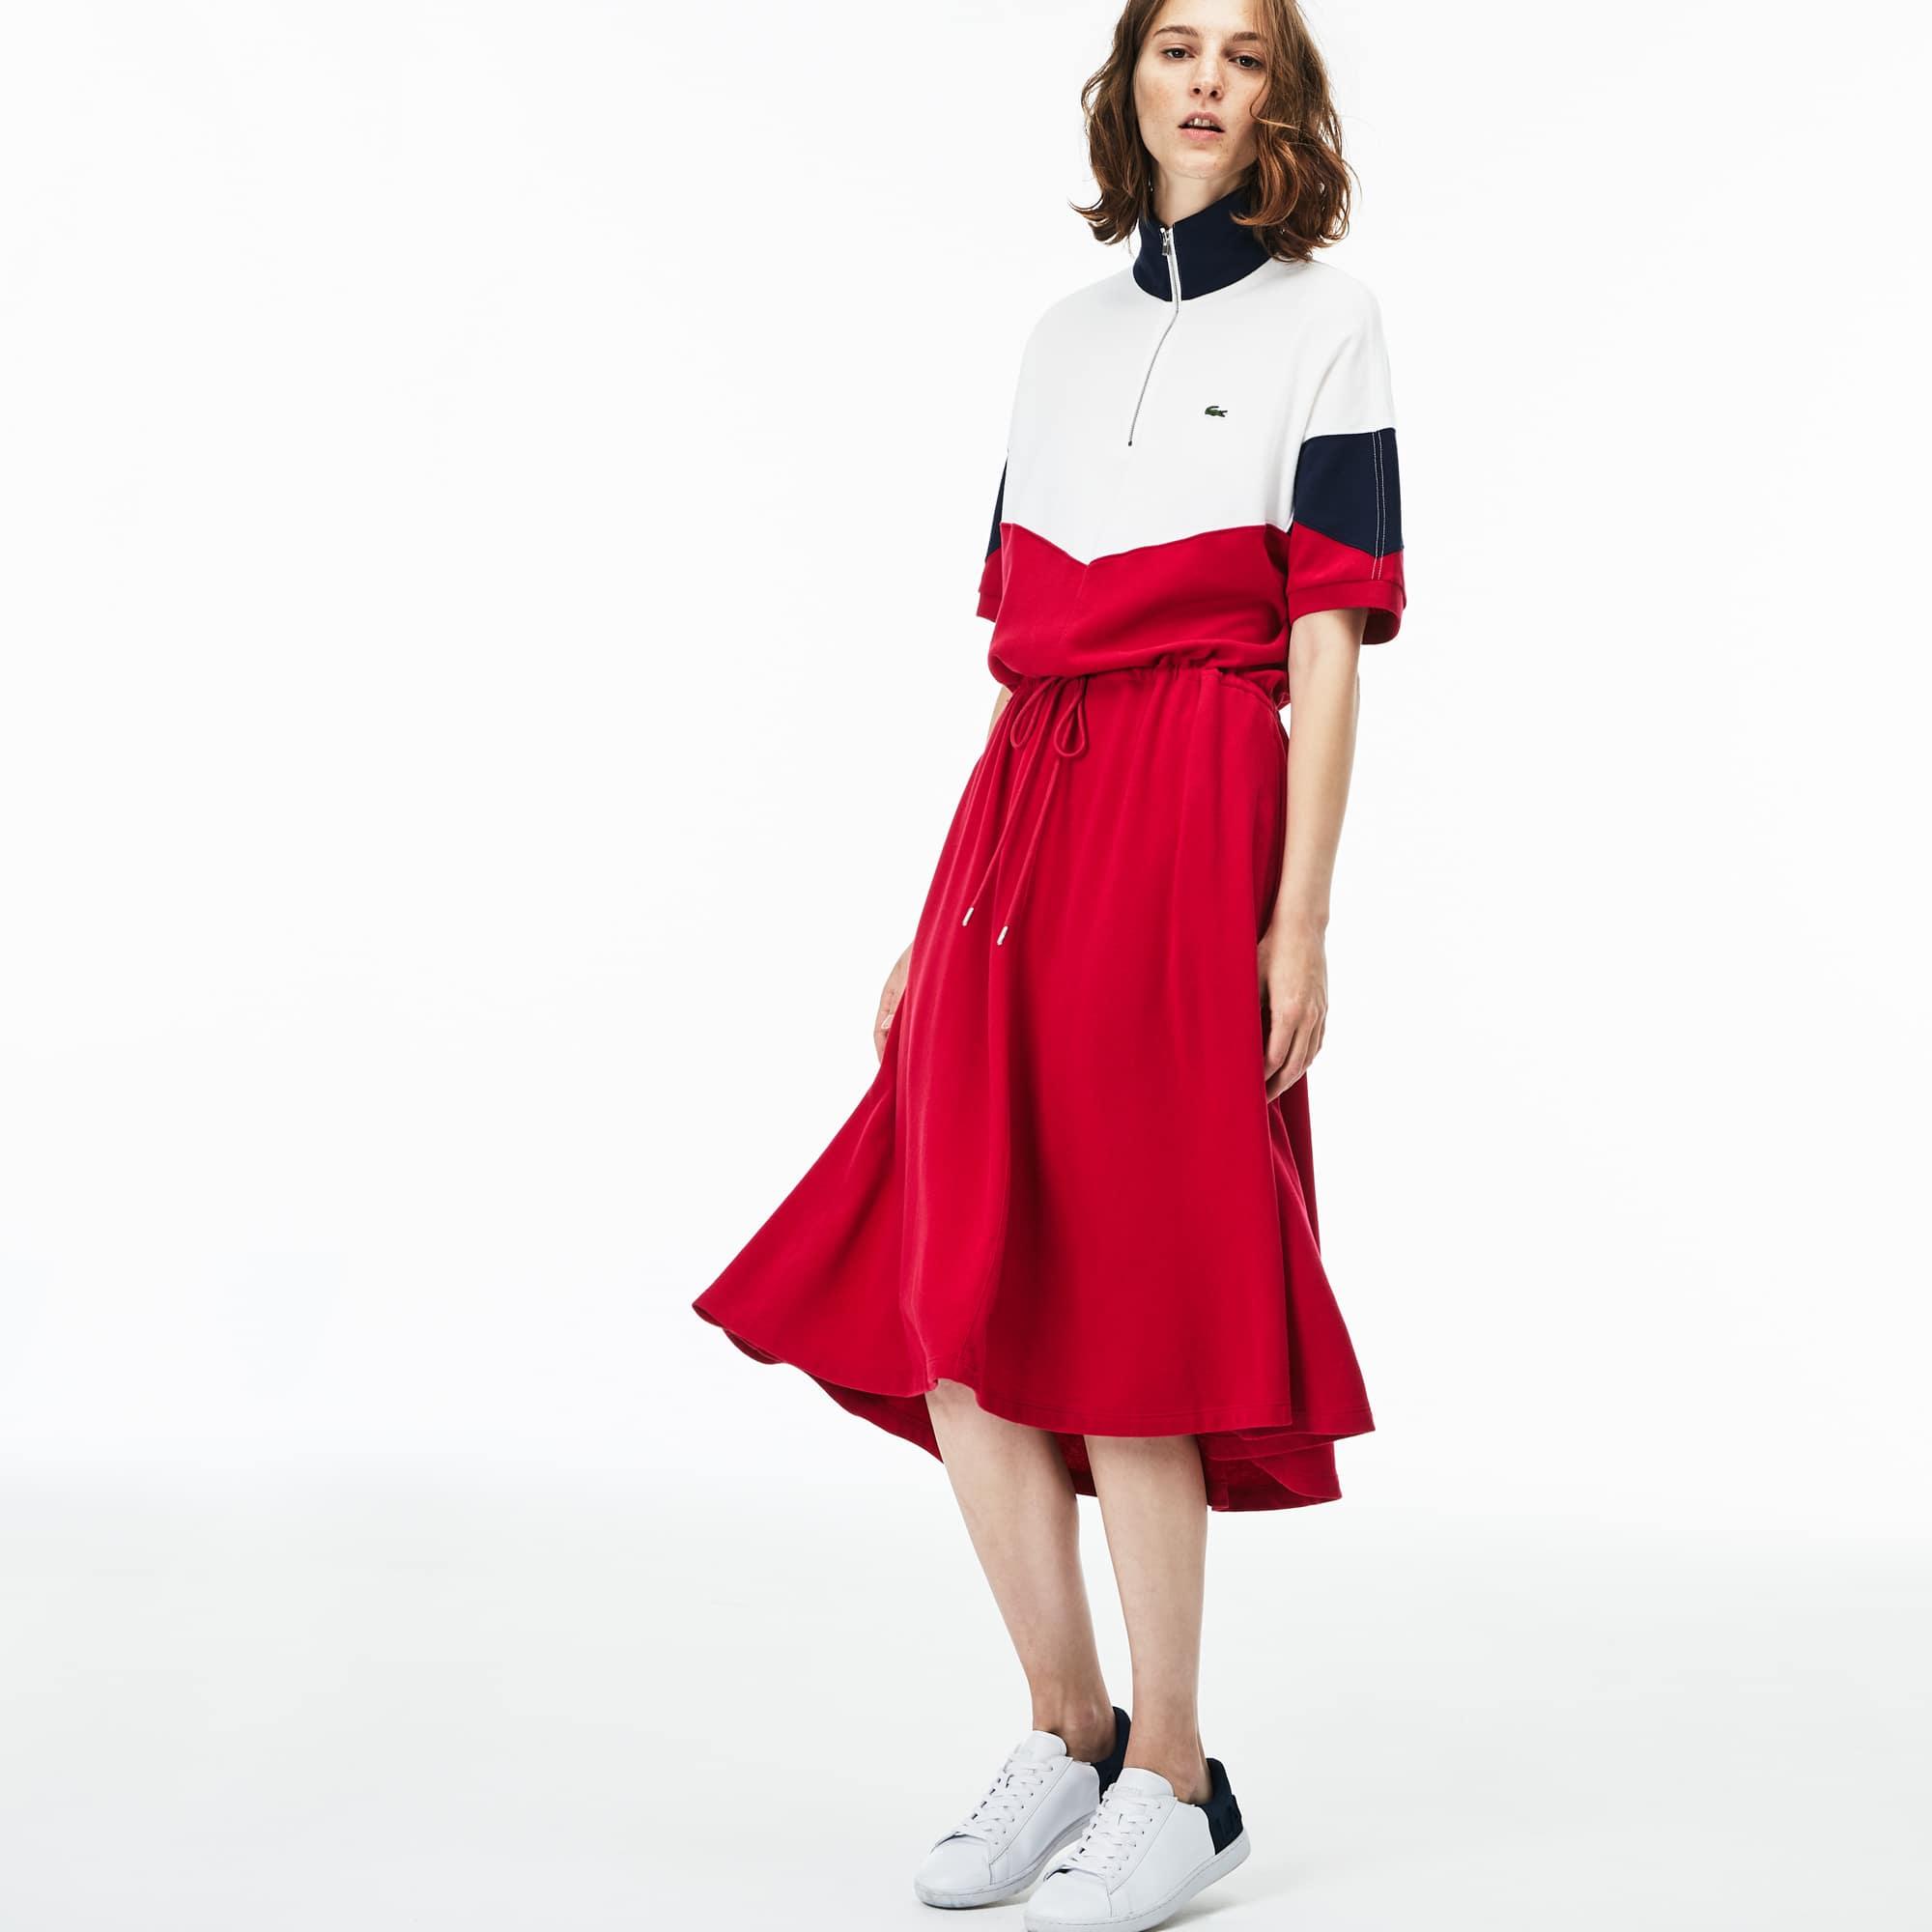 Skirts And On Women's Dresses Lacoste Sale vwq86nAHnx